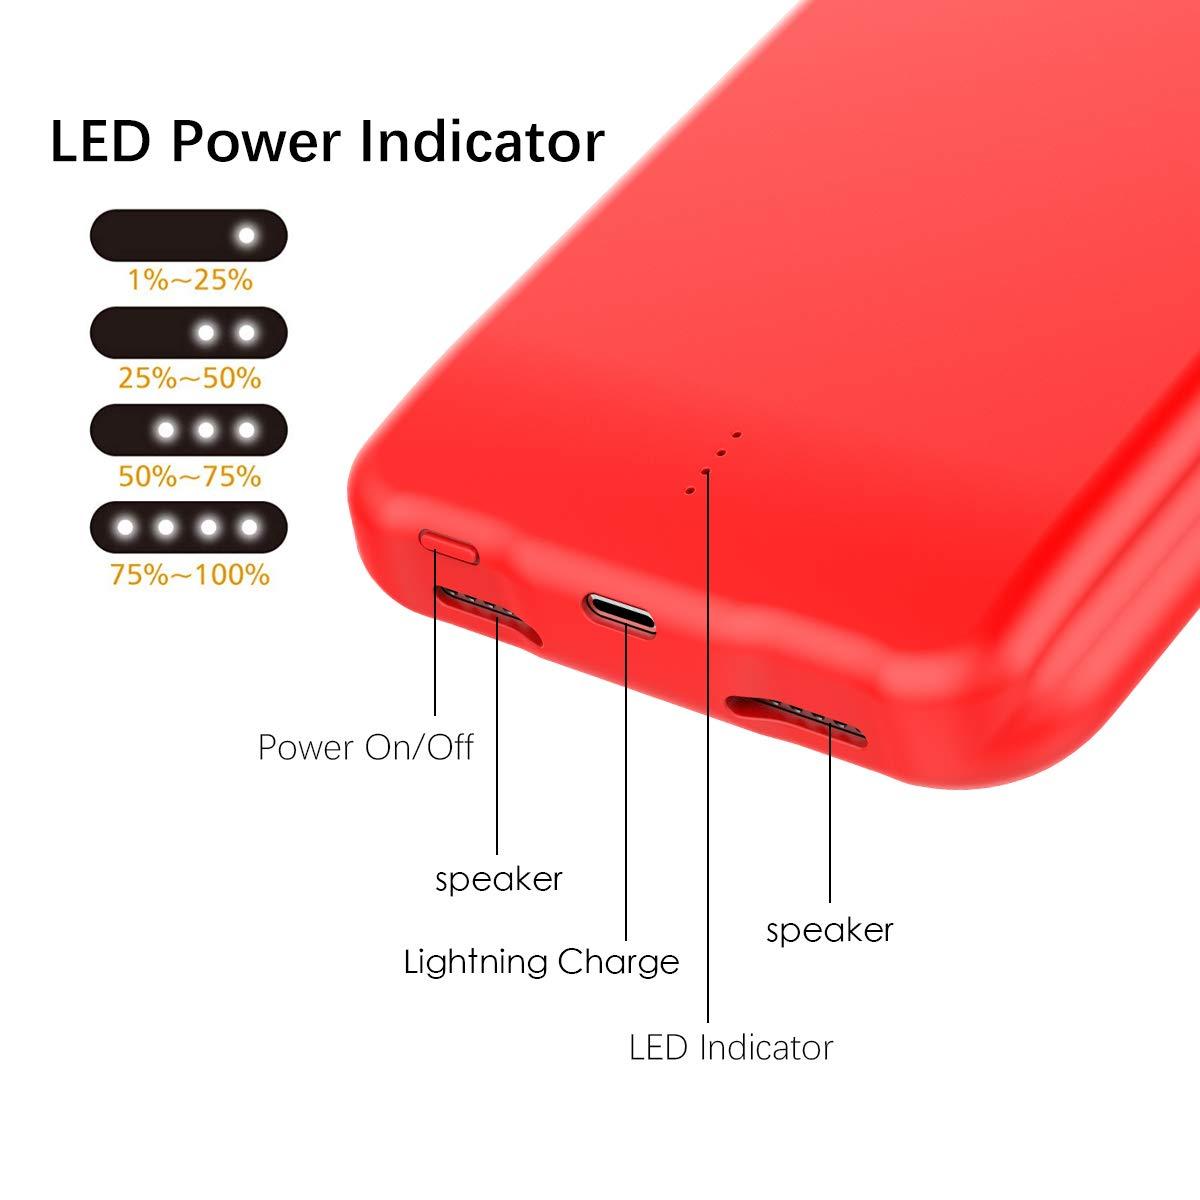 Rouge Happon Cover Batteria iPhone XS Max 5000mAh Custodia Ricaricabile con Batteria Esterna Caricabatterie Cover Battery Case Batteria Protettiva Power Bank Backup Charger Case